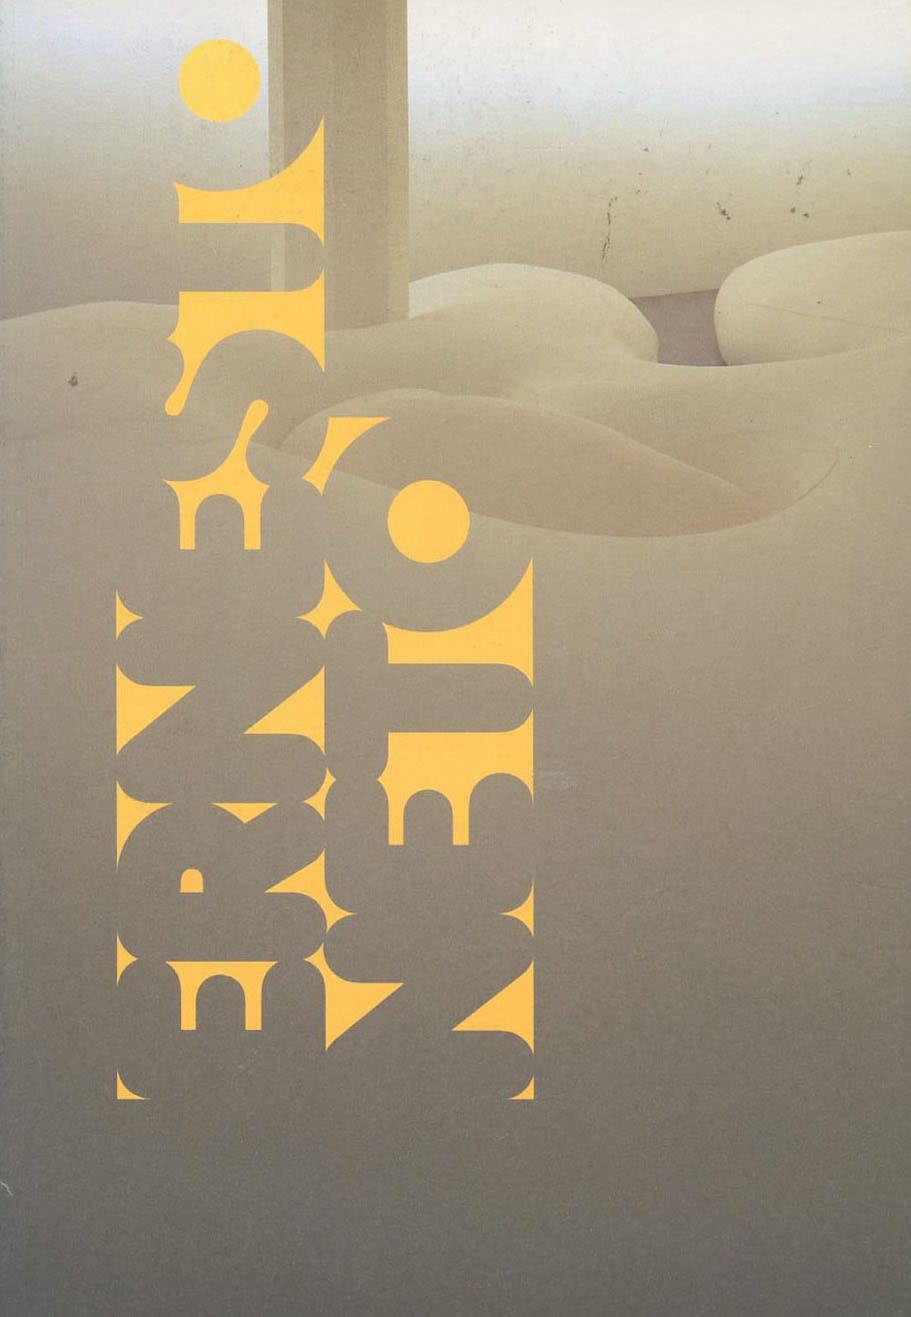 image of ernesto neto catalogue